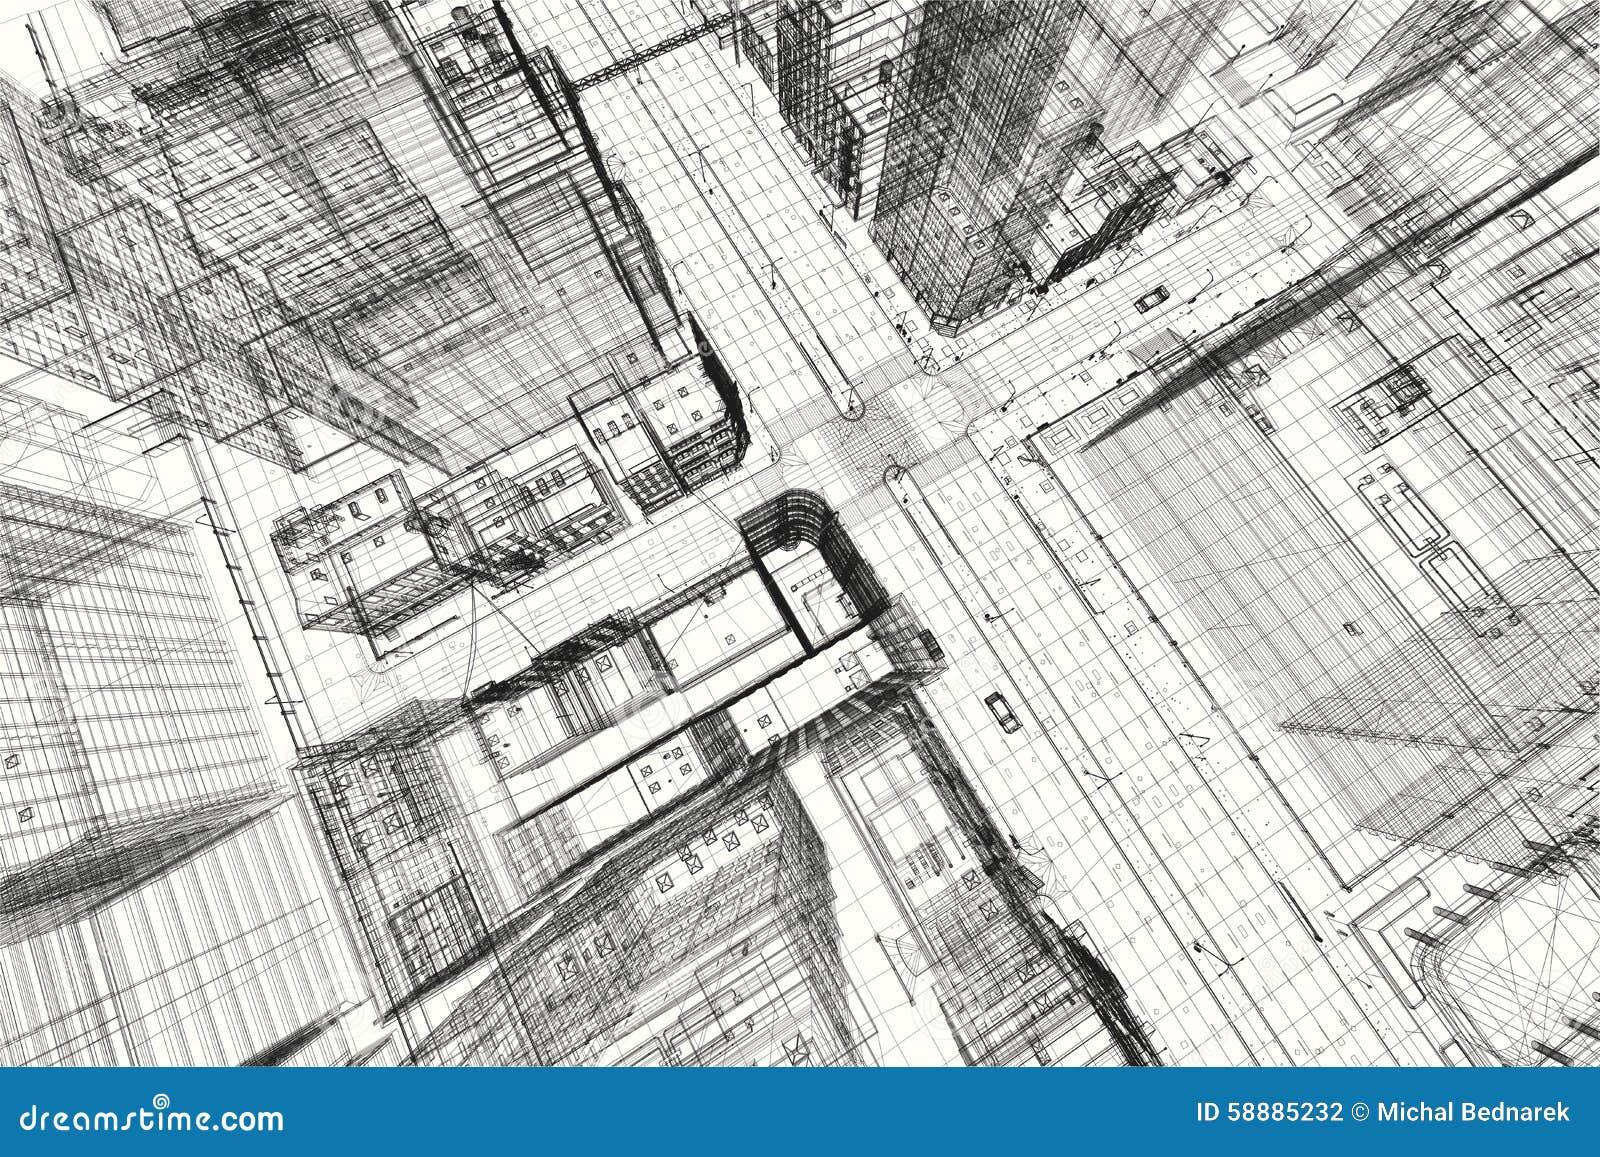 stadtbauvorhaben wireframe 3d druck st dtischer plan. Black Bedroom Furniture Sets. Home Design Ideas